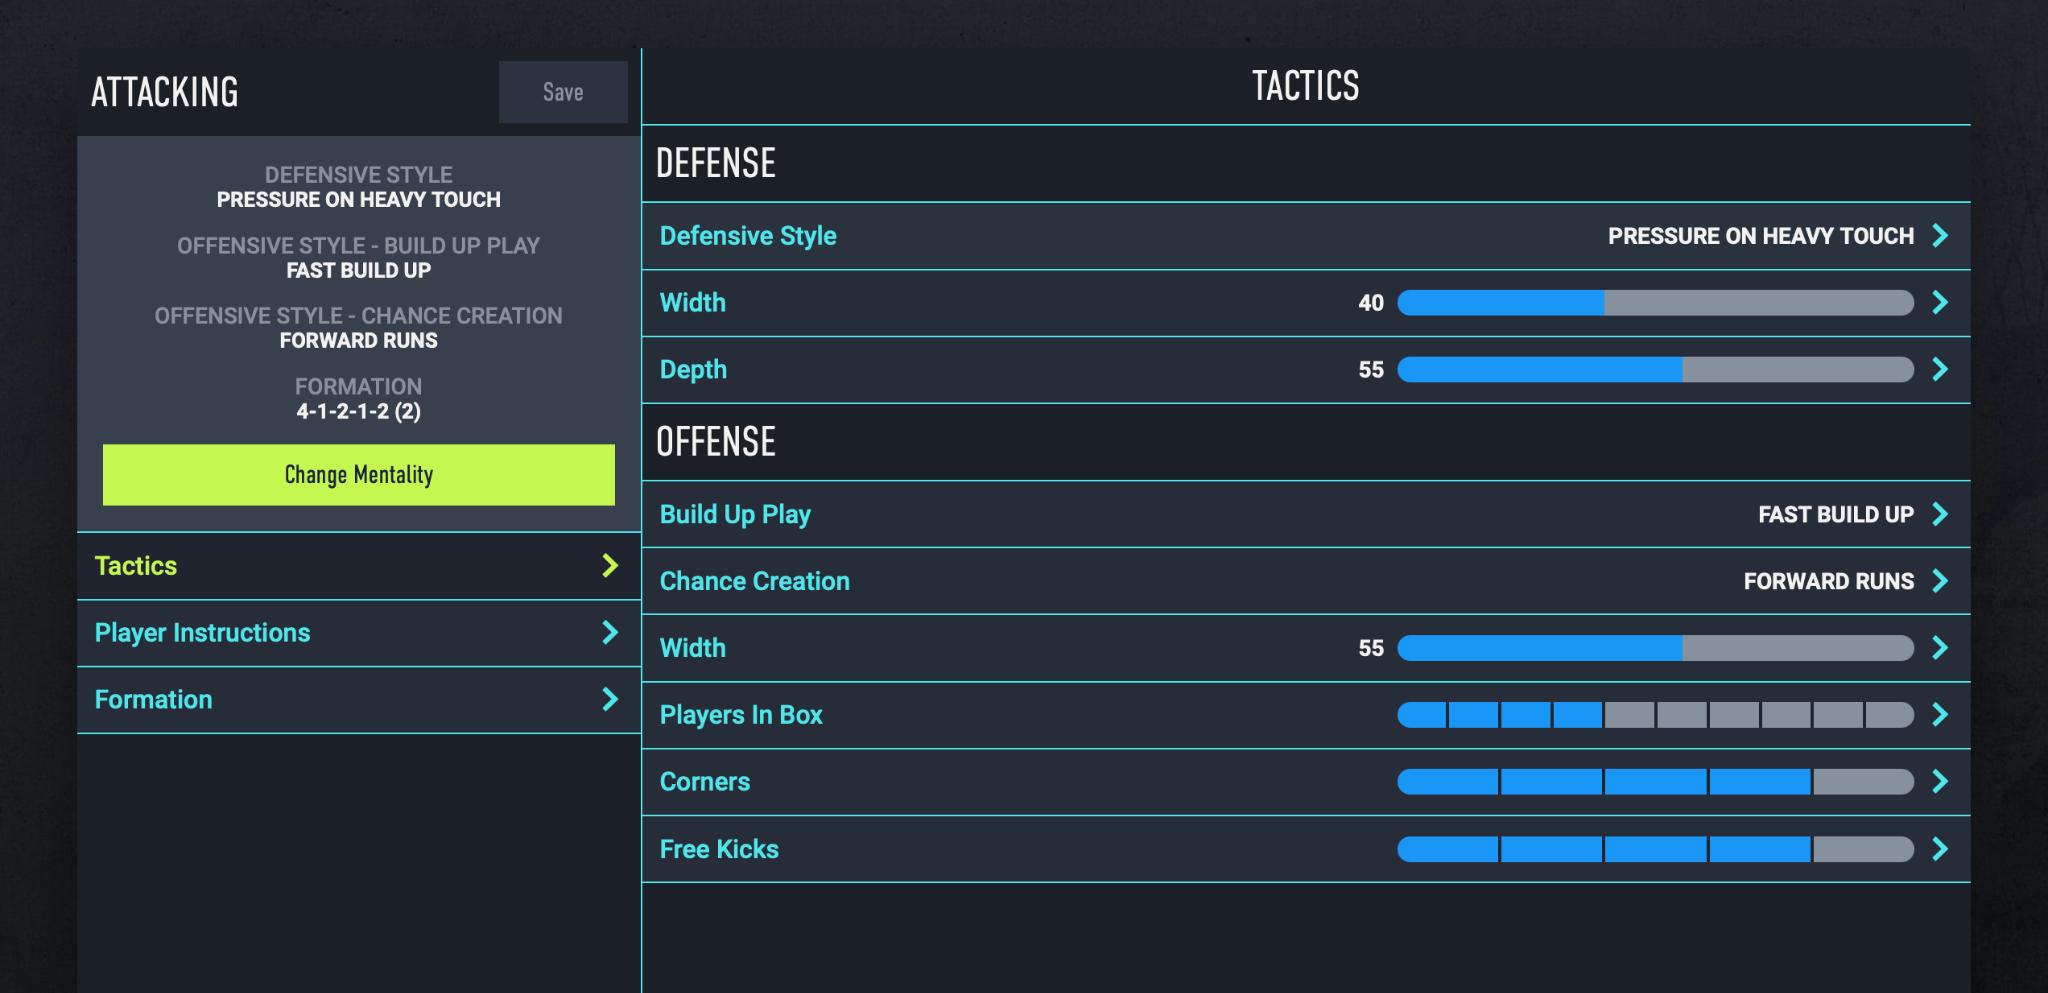 Custom Tactics on the FUT App